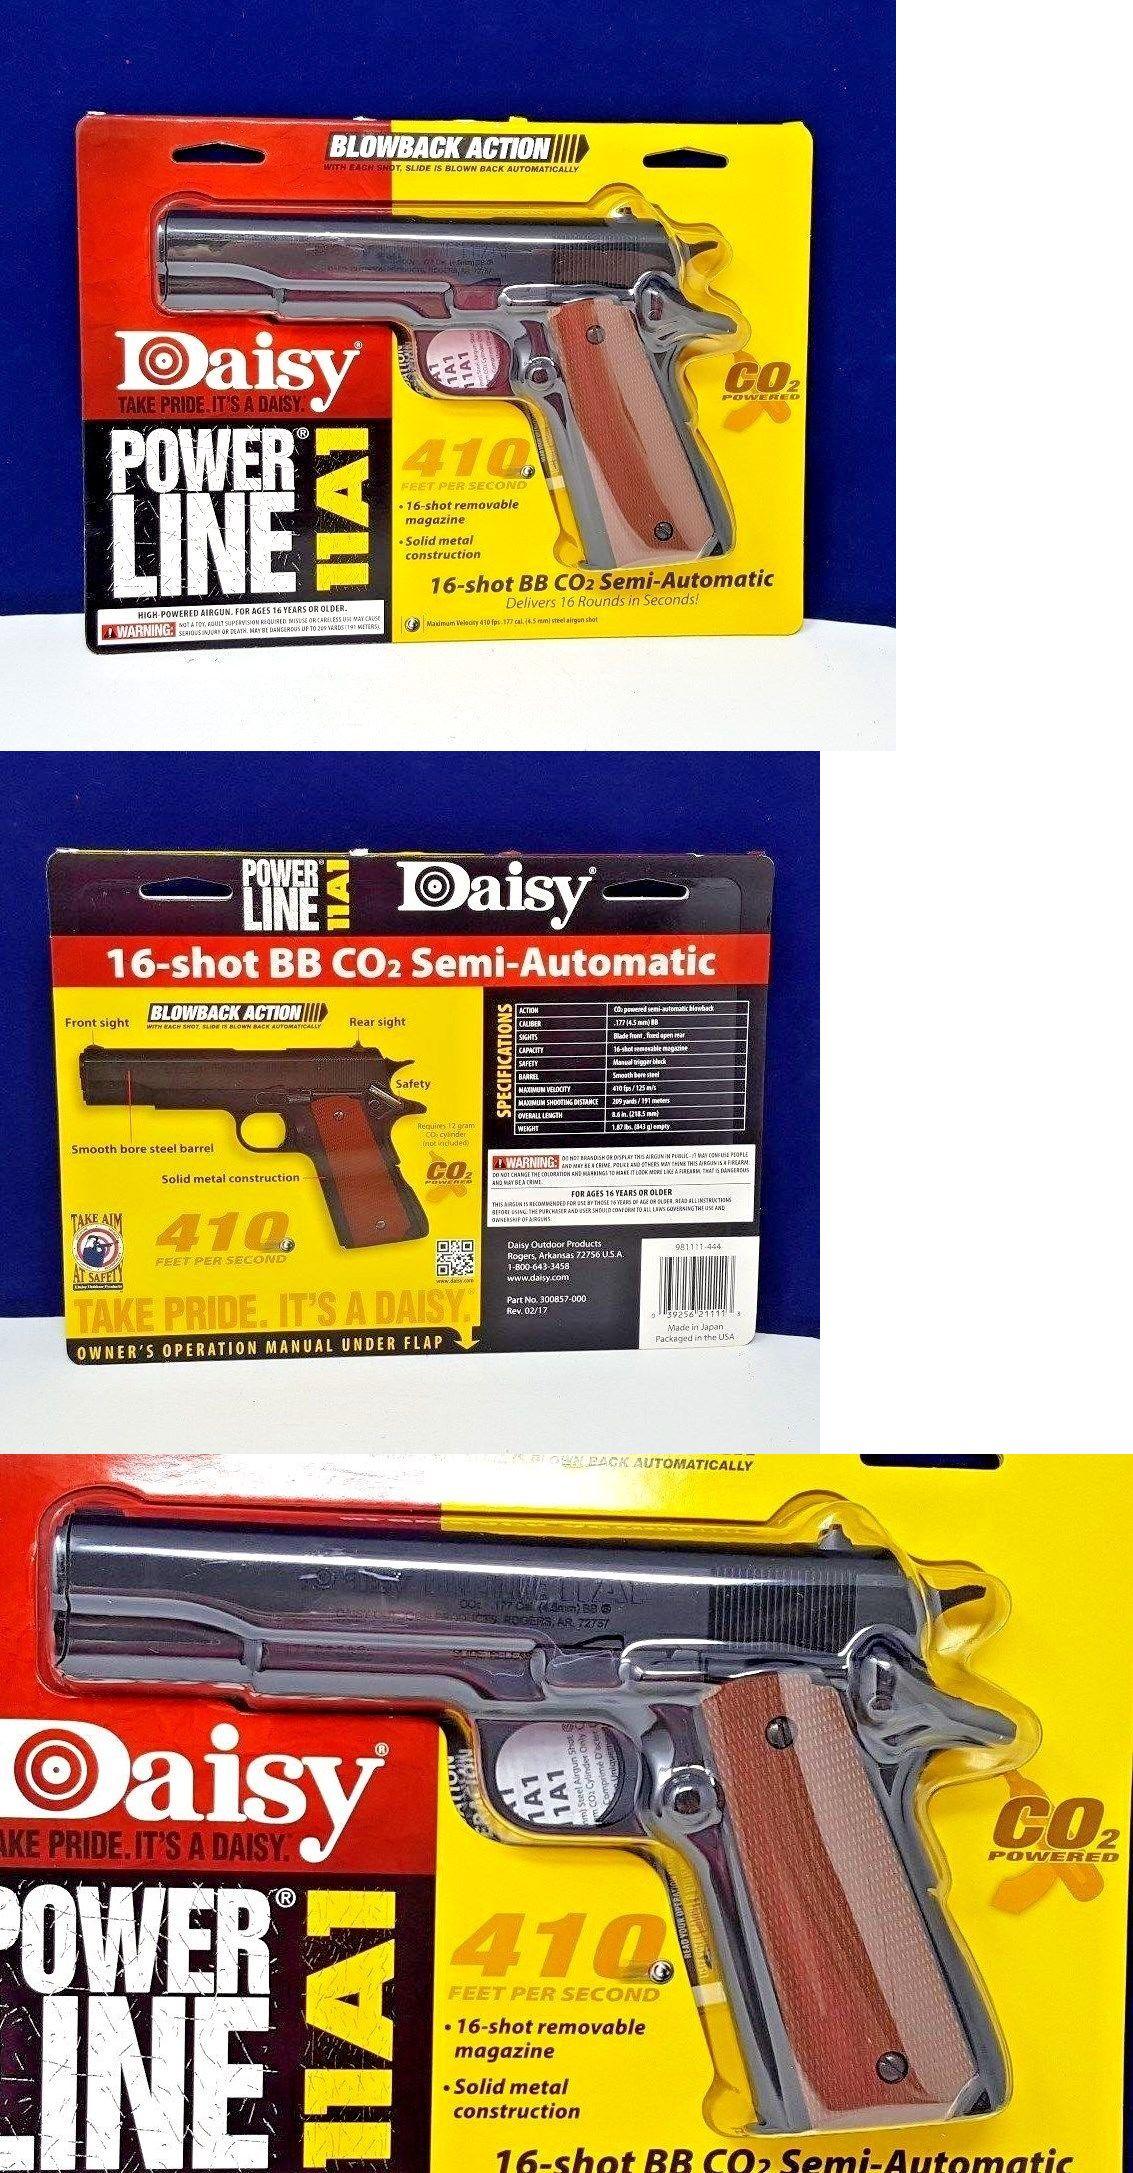 Daisy PowerLine 11A1 C02 16-Shot Semi-Automatic BB Gun Pistol